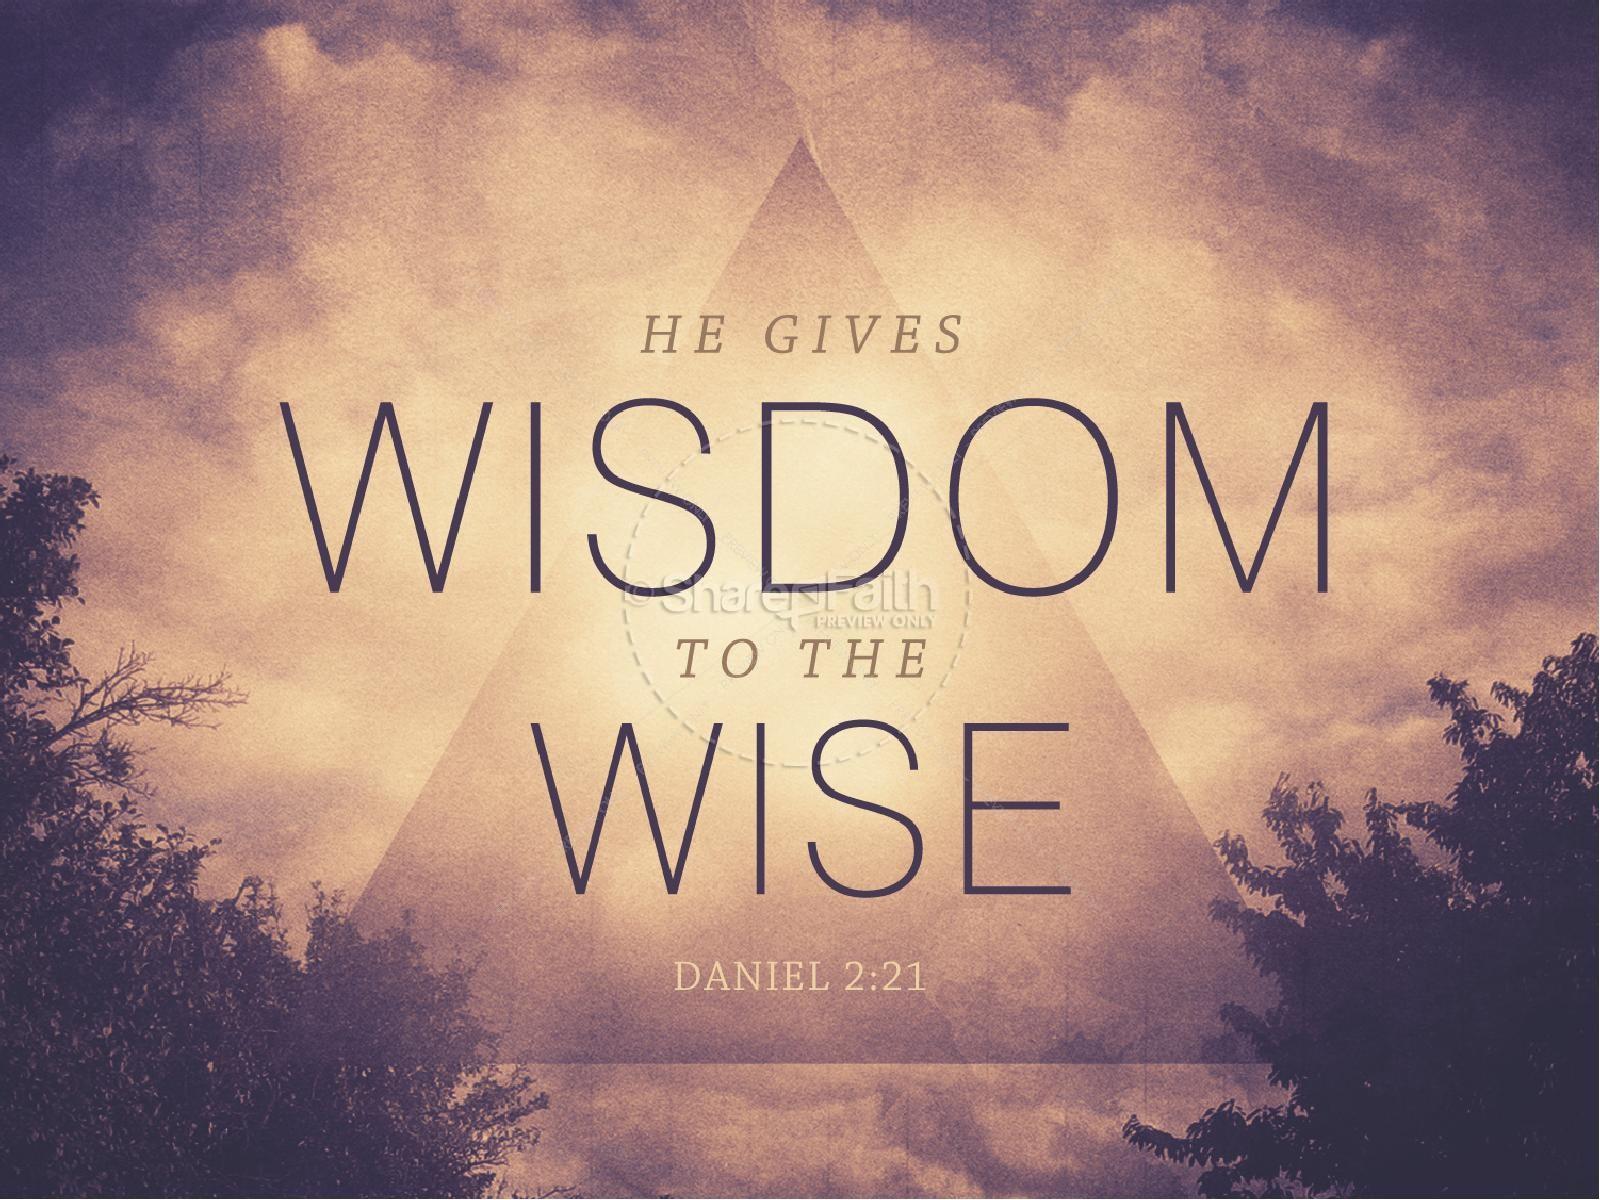 Christian Wallpaper Fall Offering He Gives Wisdom Church Powerpoint Powerpoint Sermons